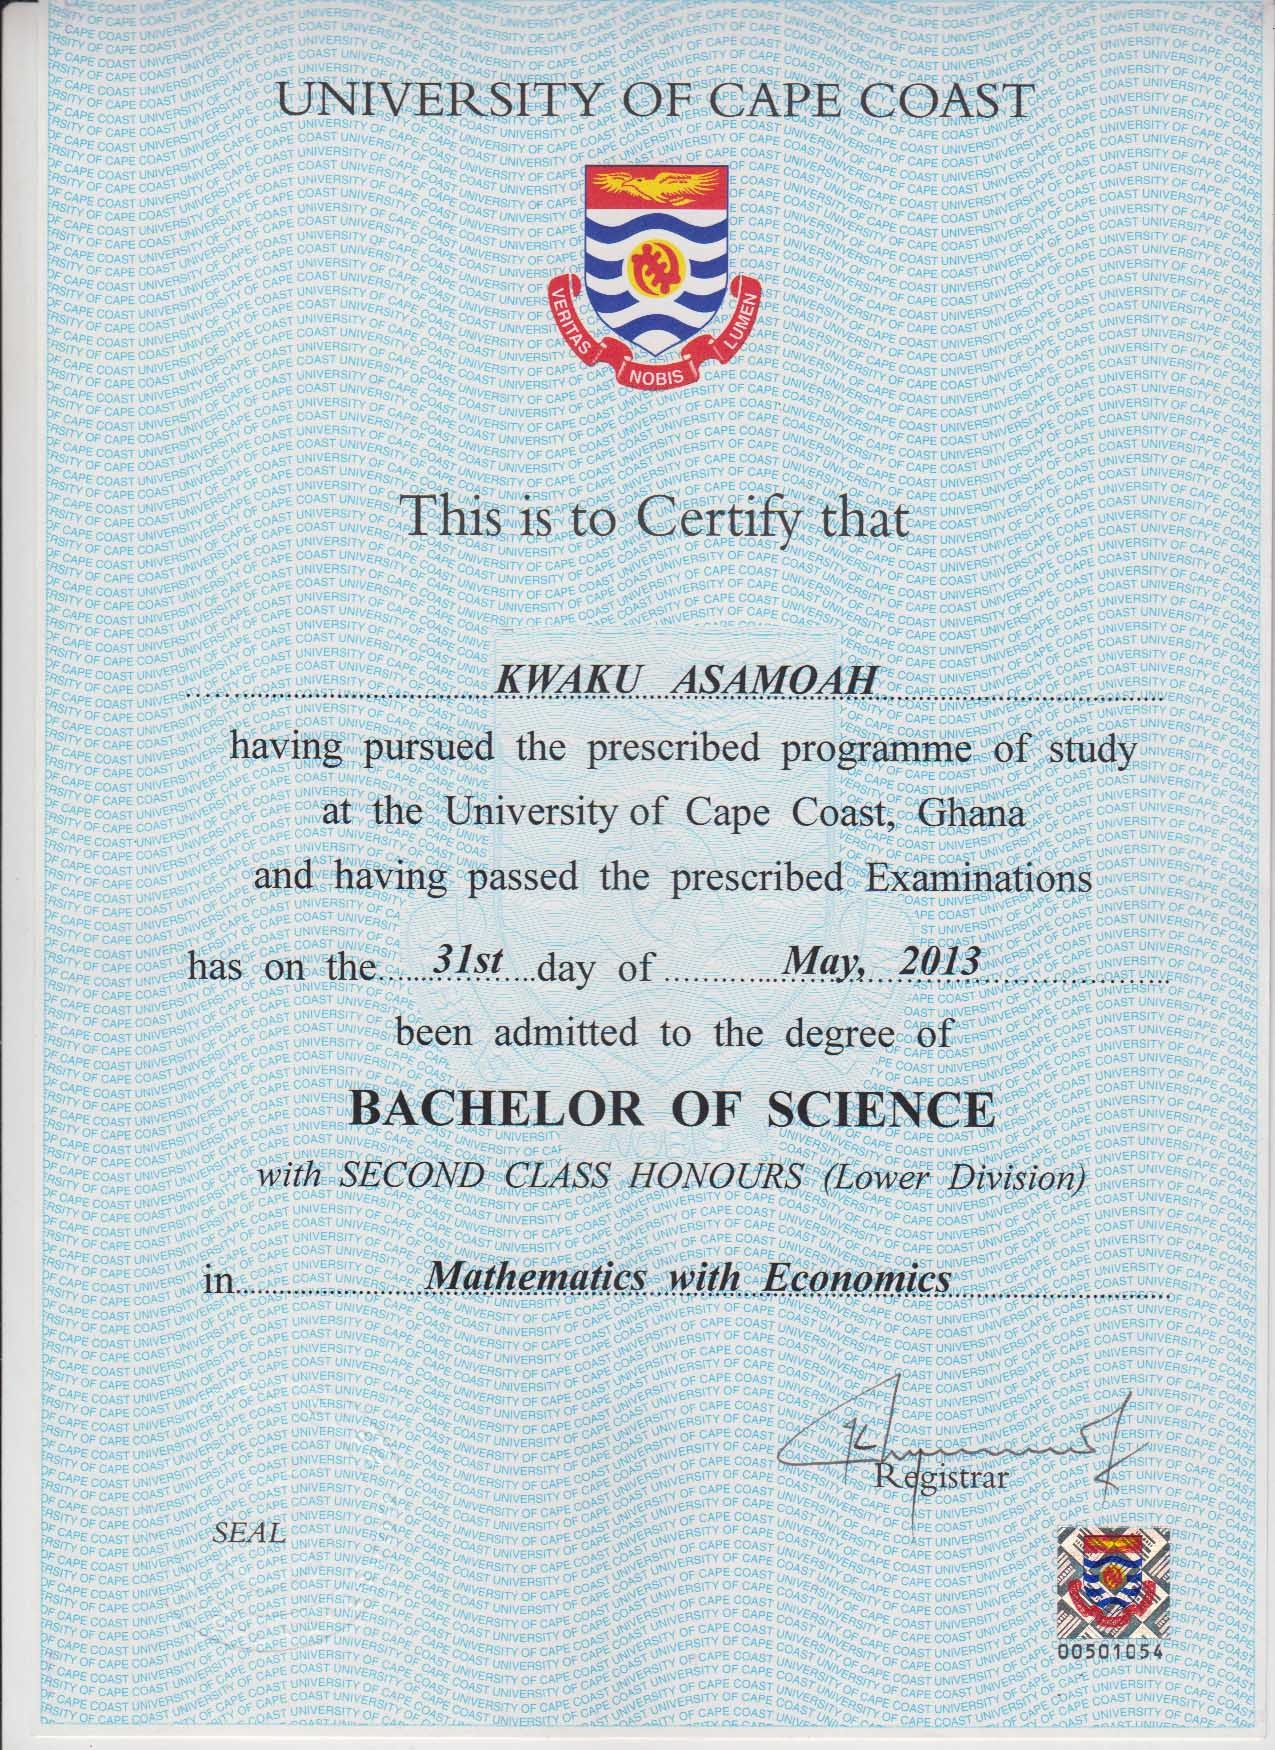 Kwaku asamoah bayt introduction to computing statistics and statistical analysis mathematical analysis complex analysis 1betcityfo Choice Image